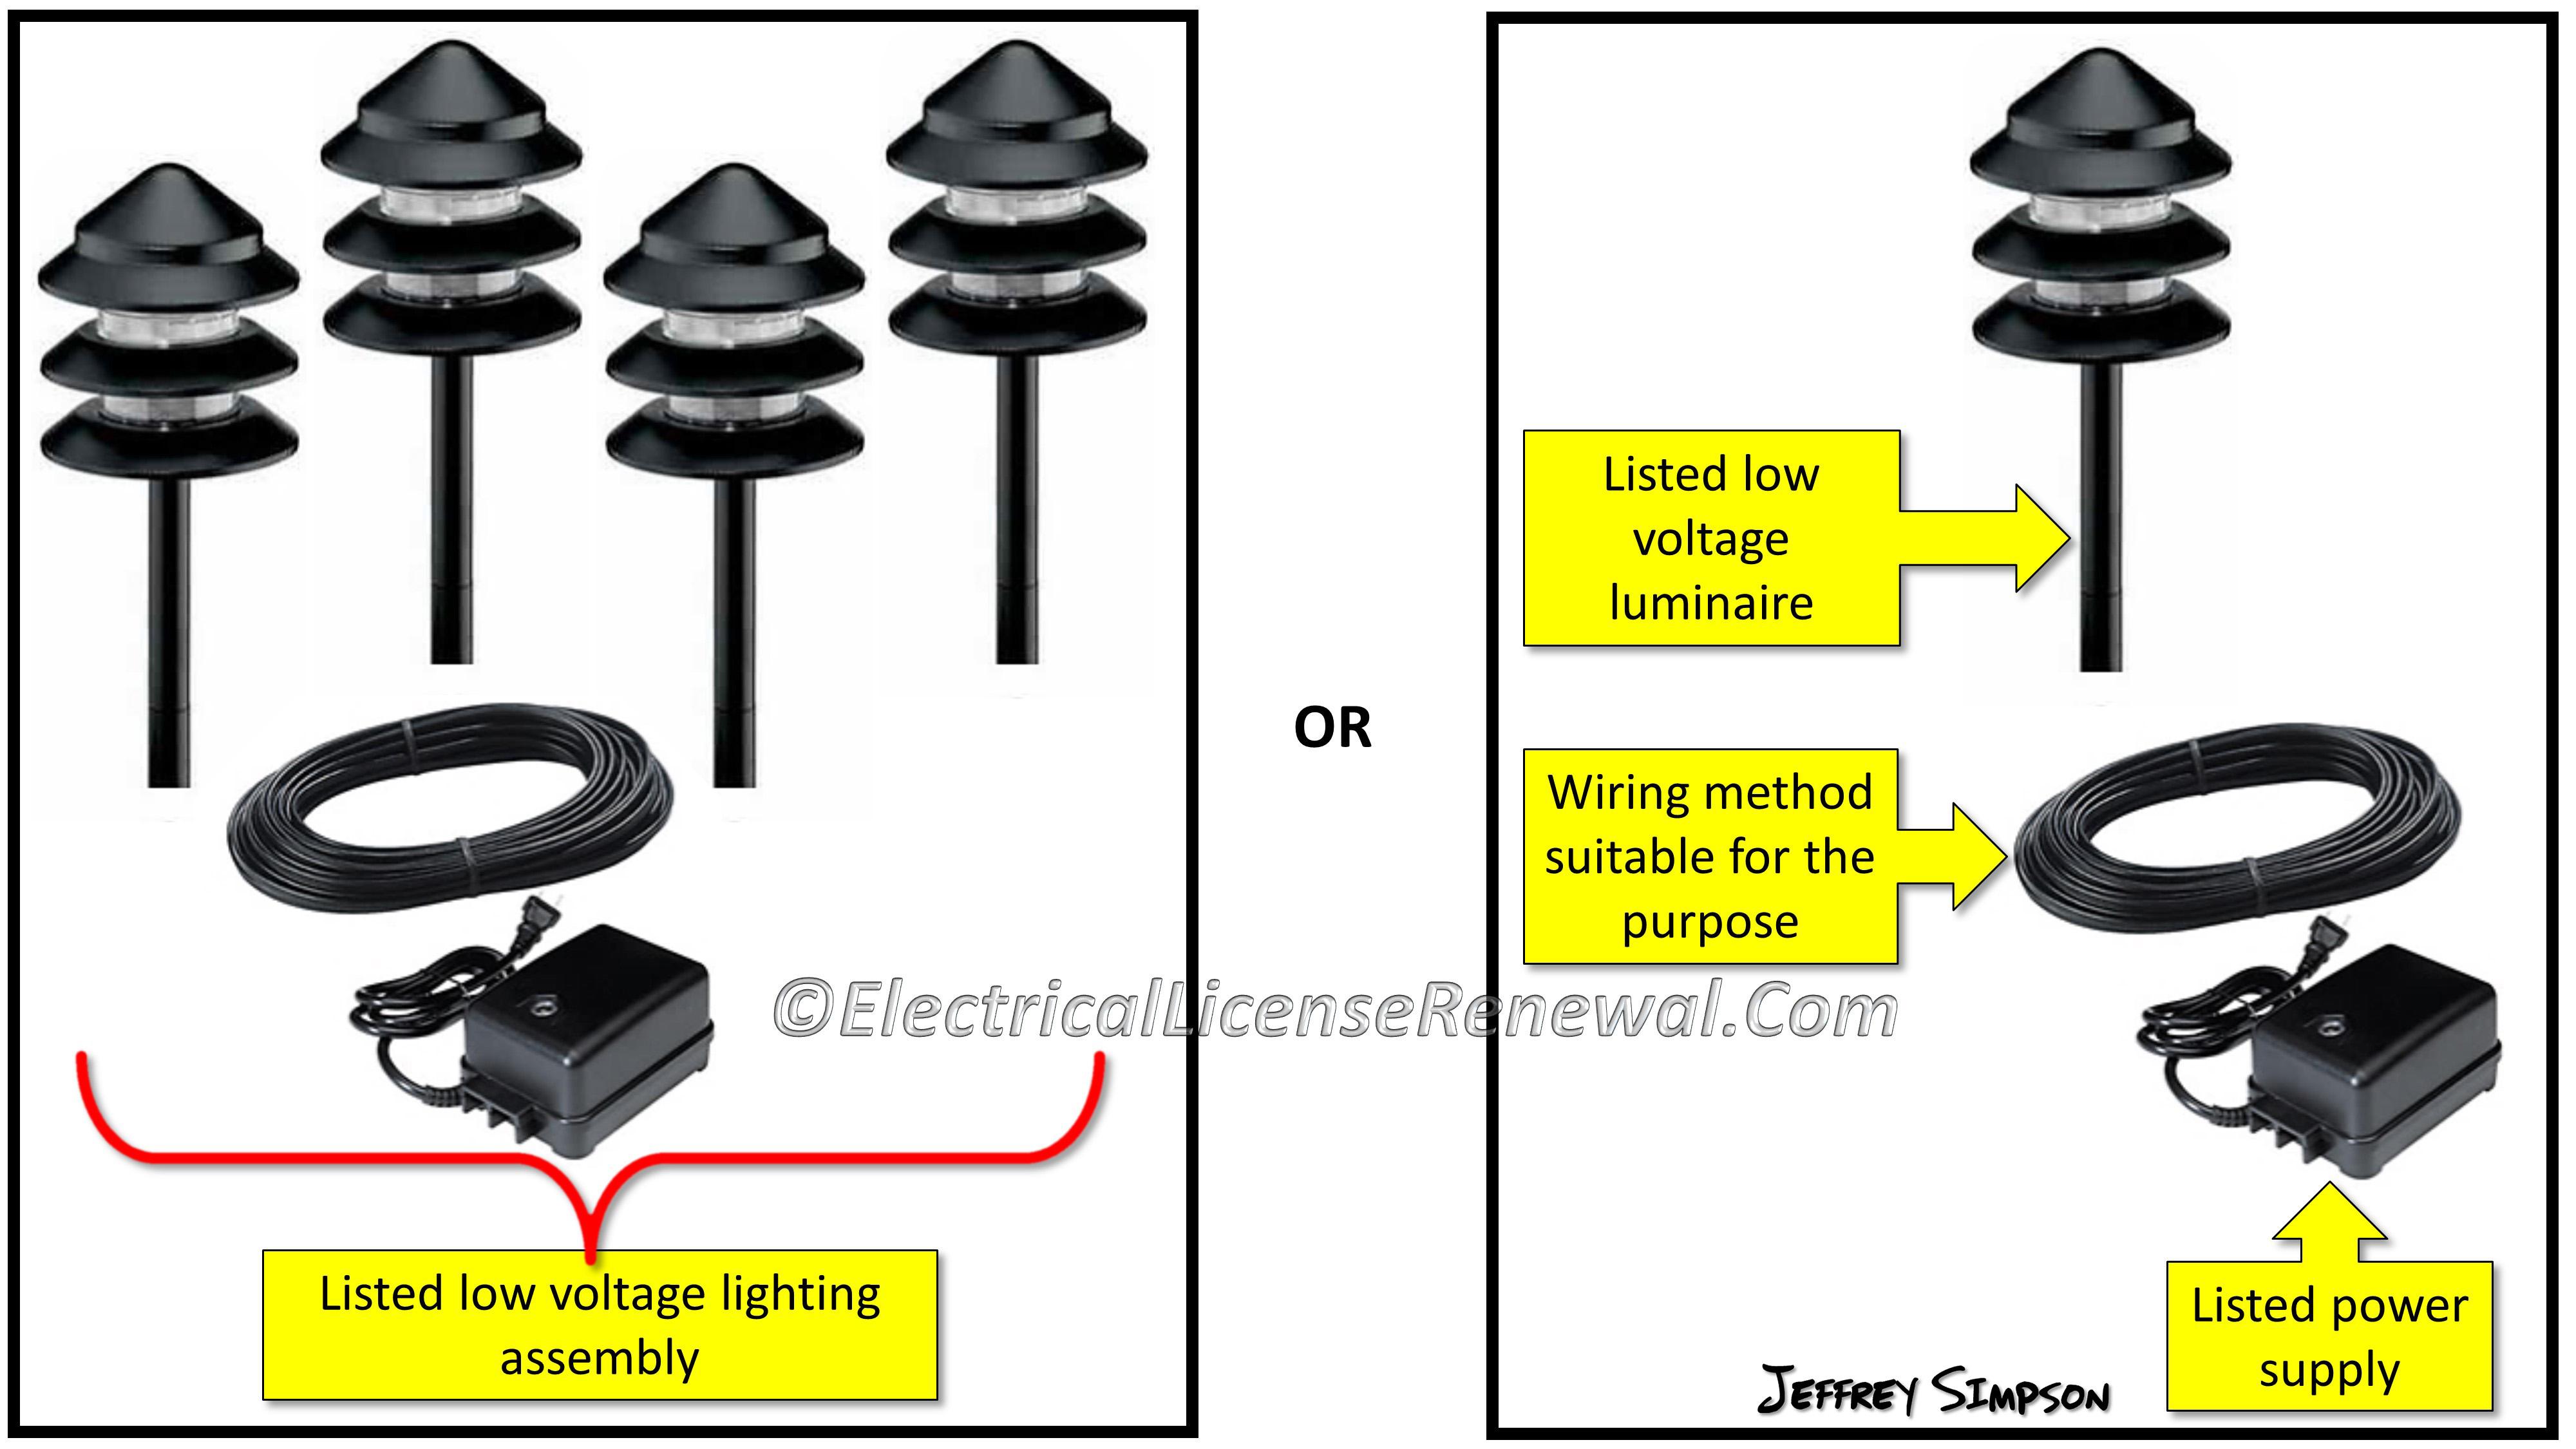 411 Article 411  Low-Voltage Lighting